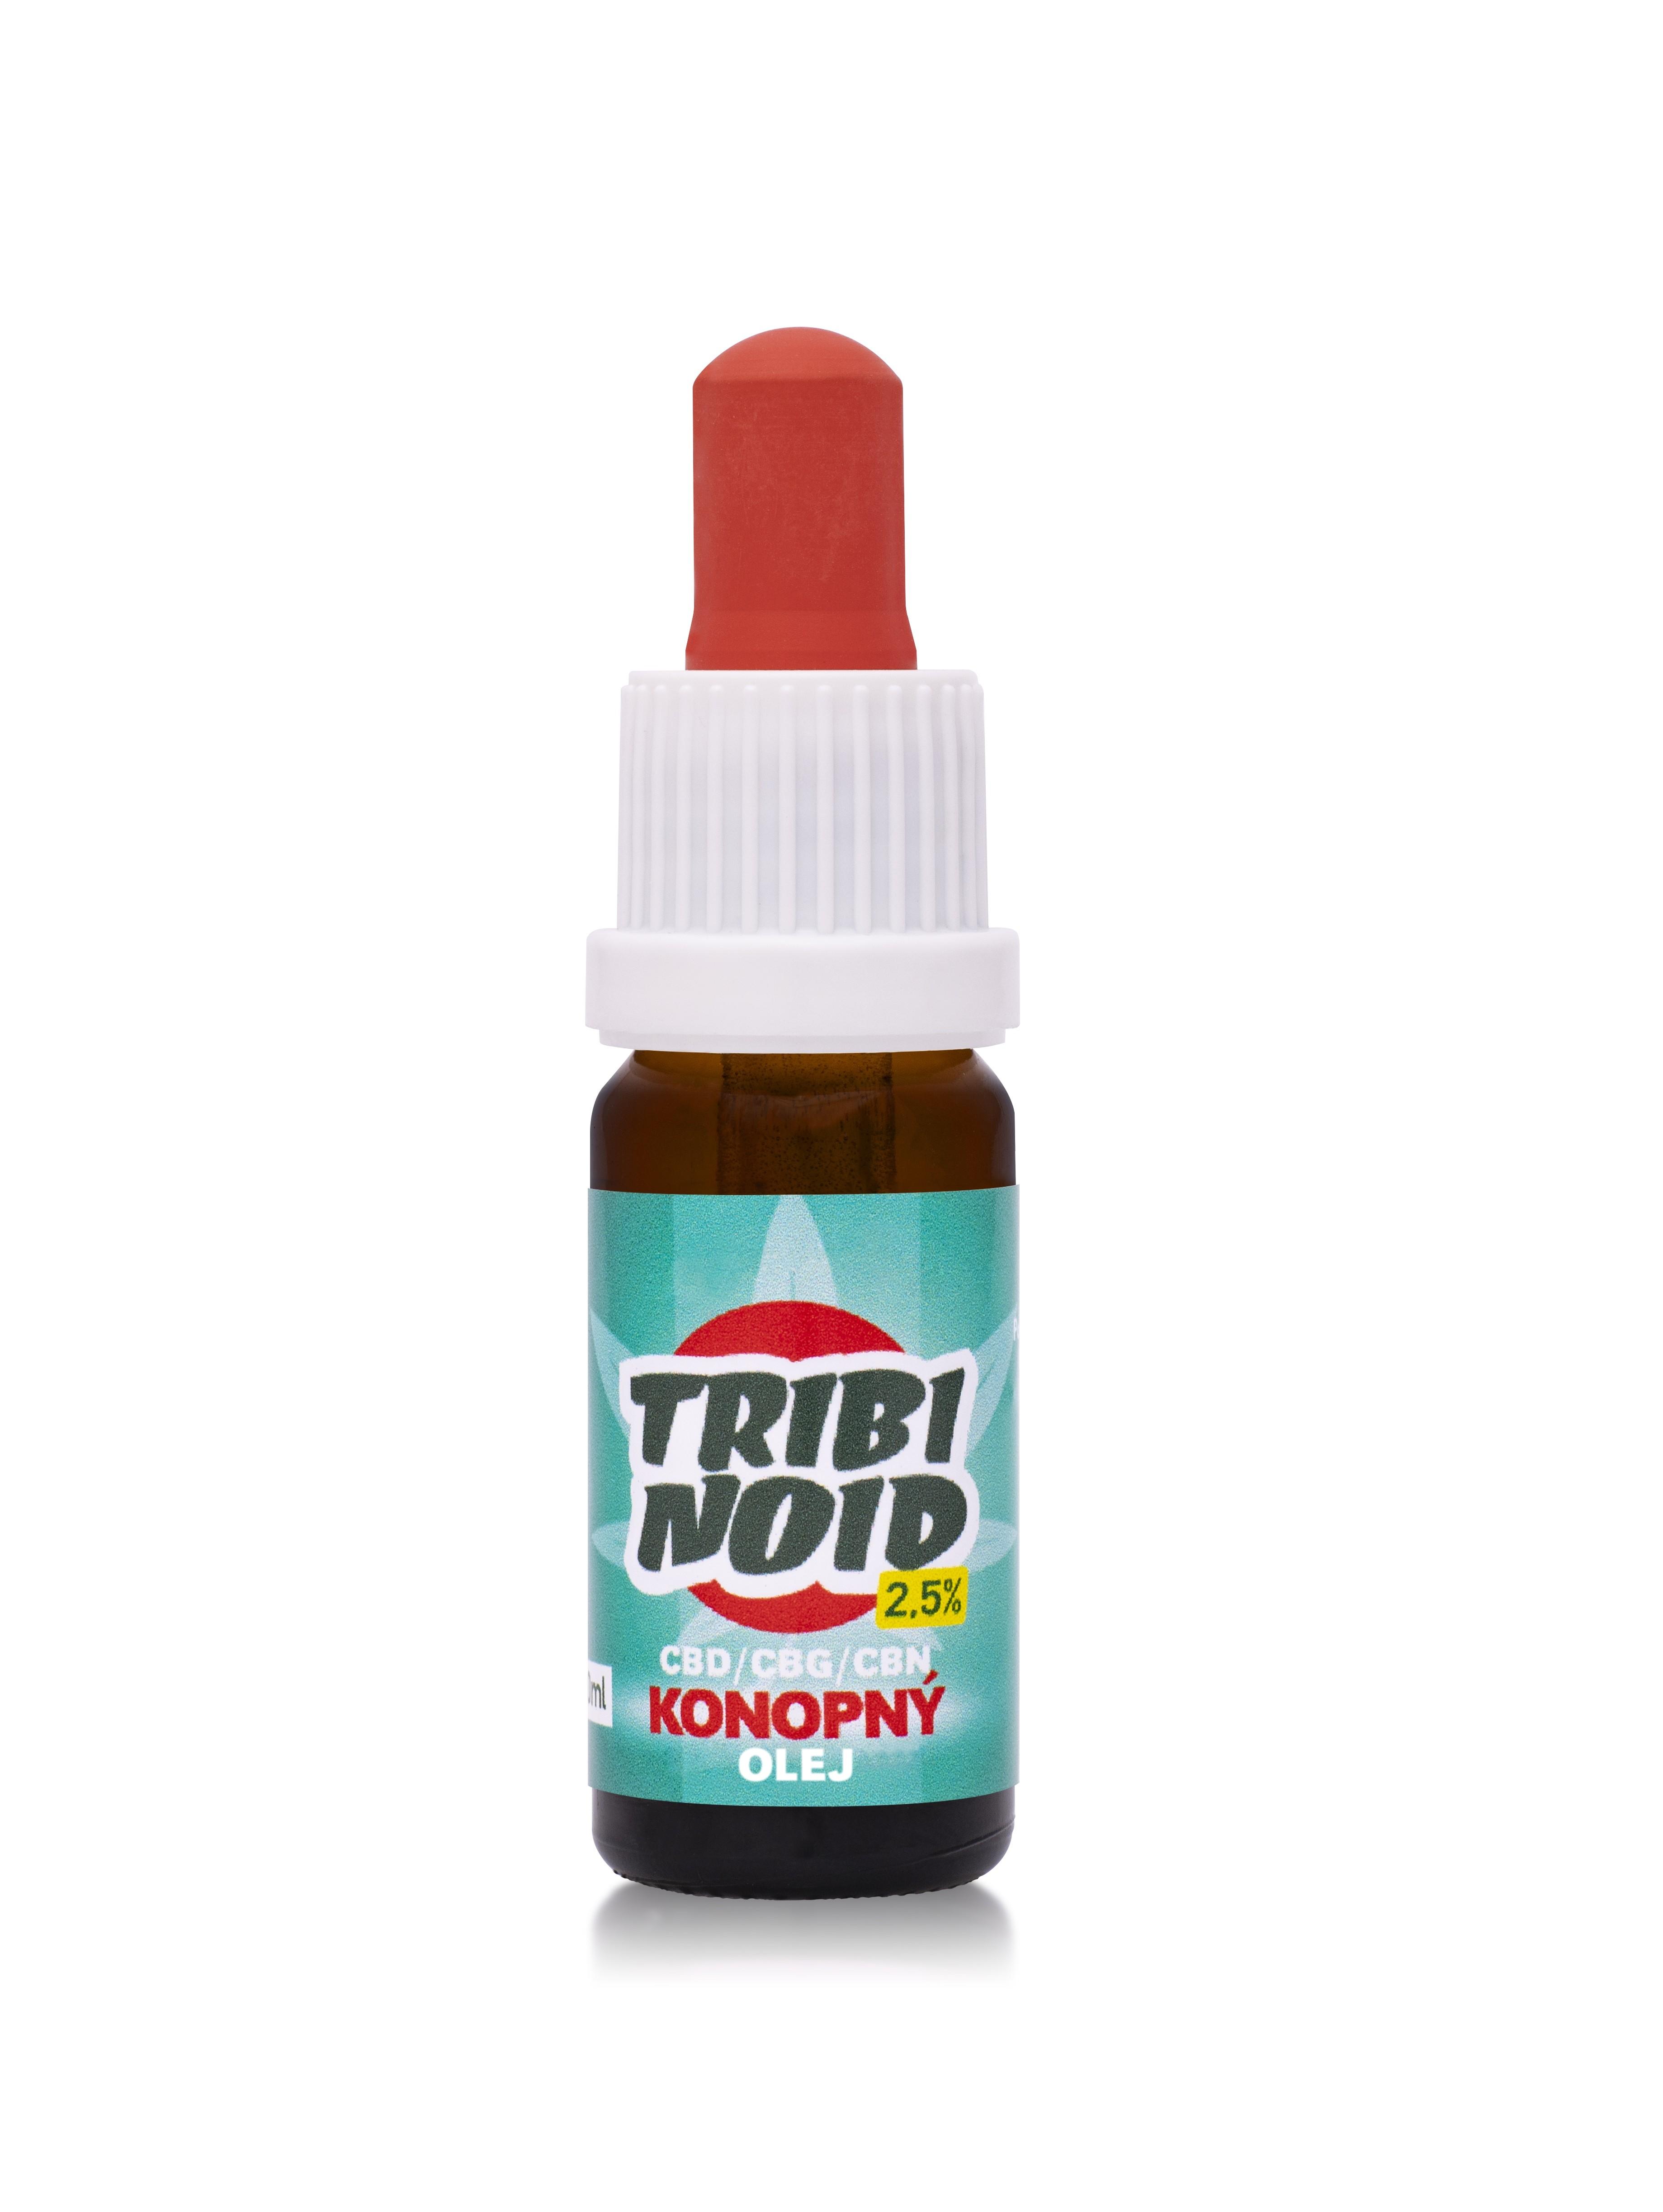 2,5% Tribinoid - Konopný  olej